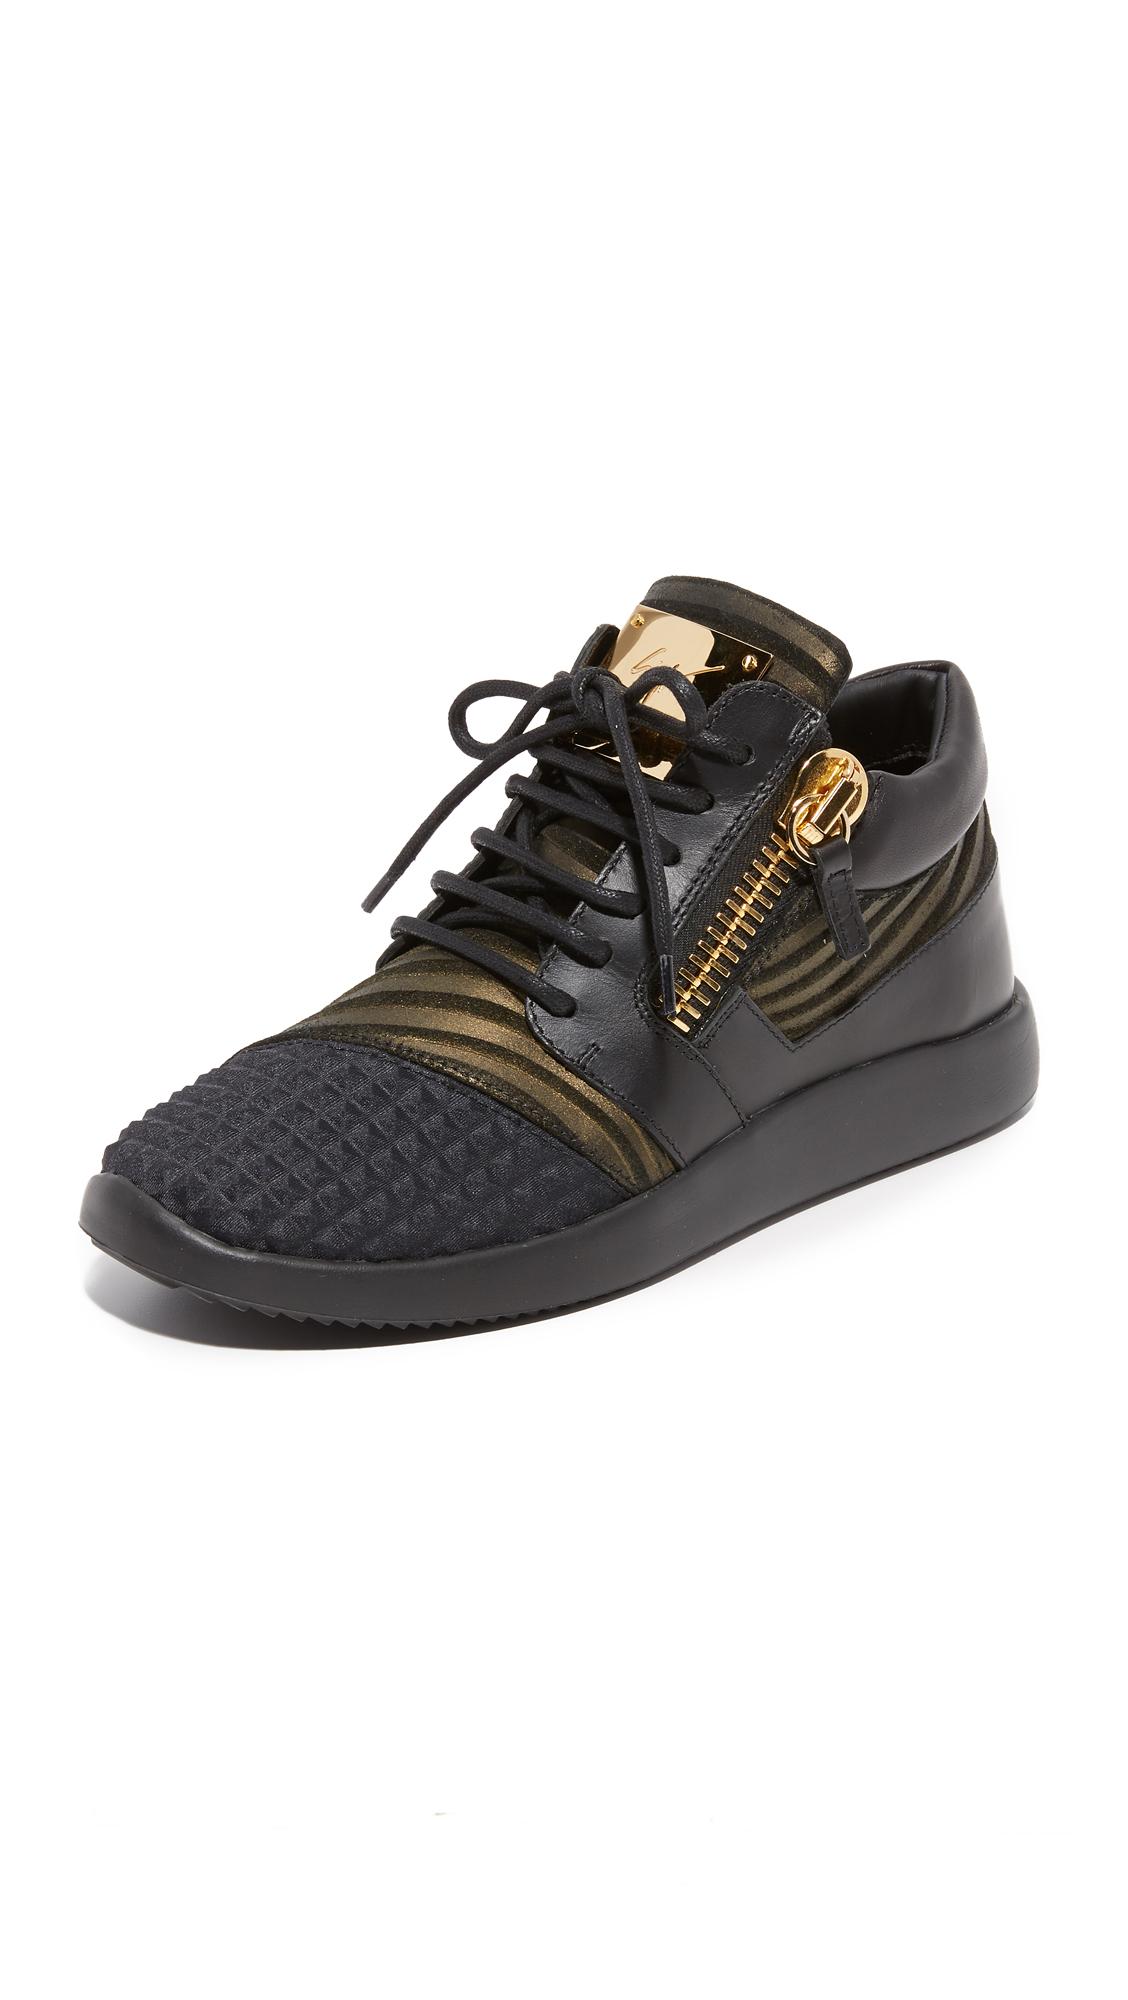 Giuseppe Zanotti Leather Sneakers - Nero